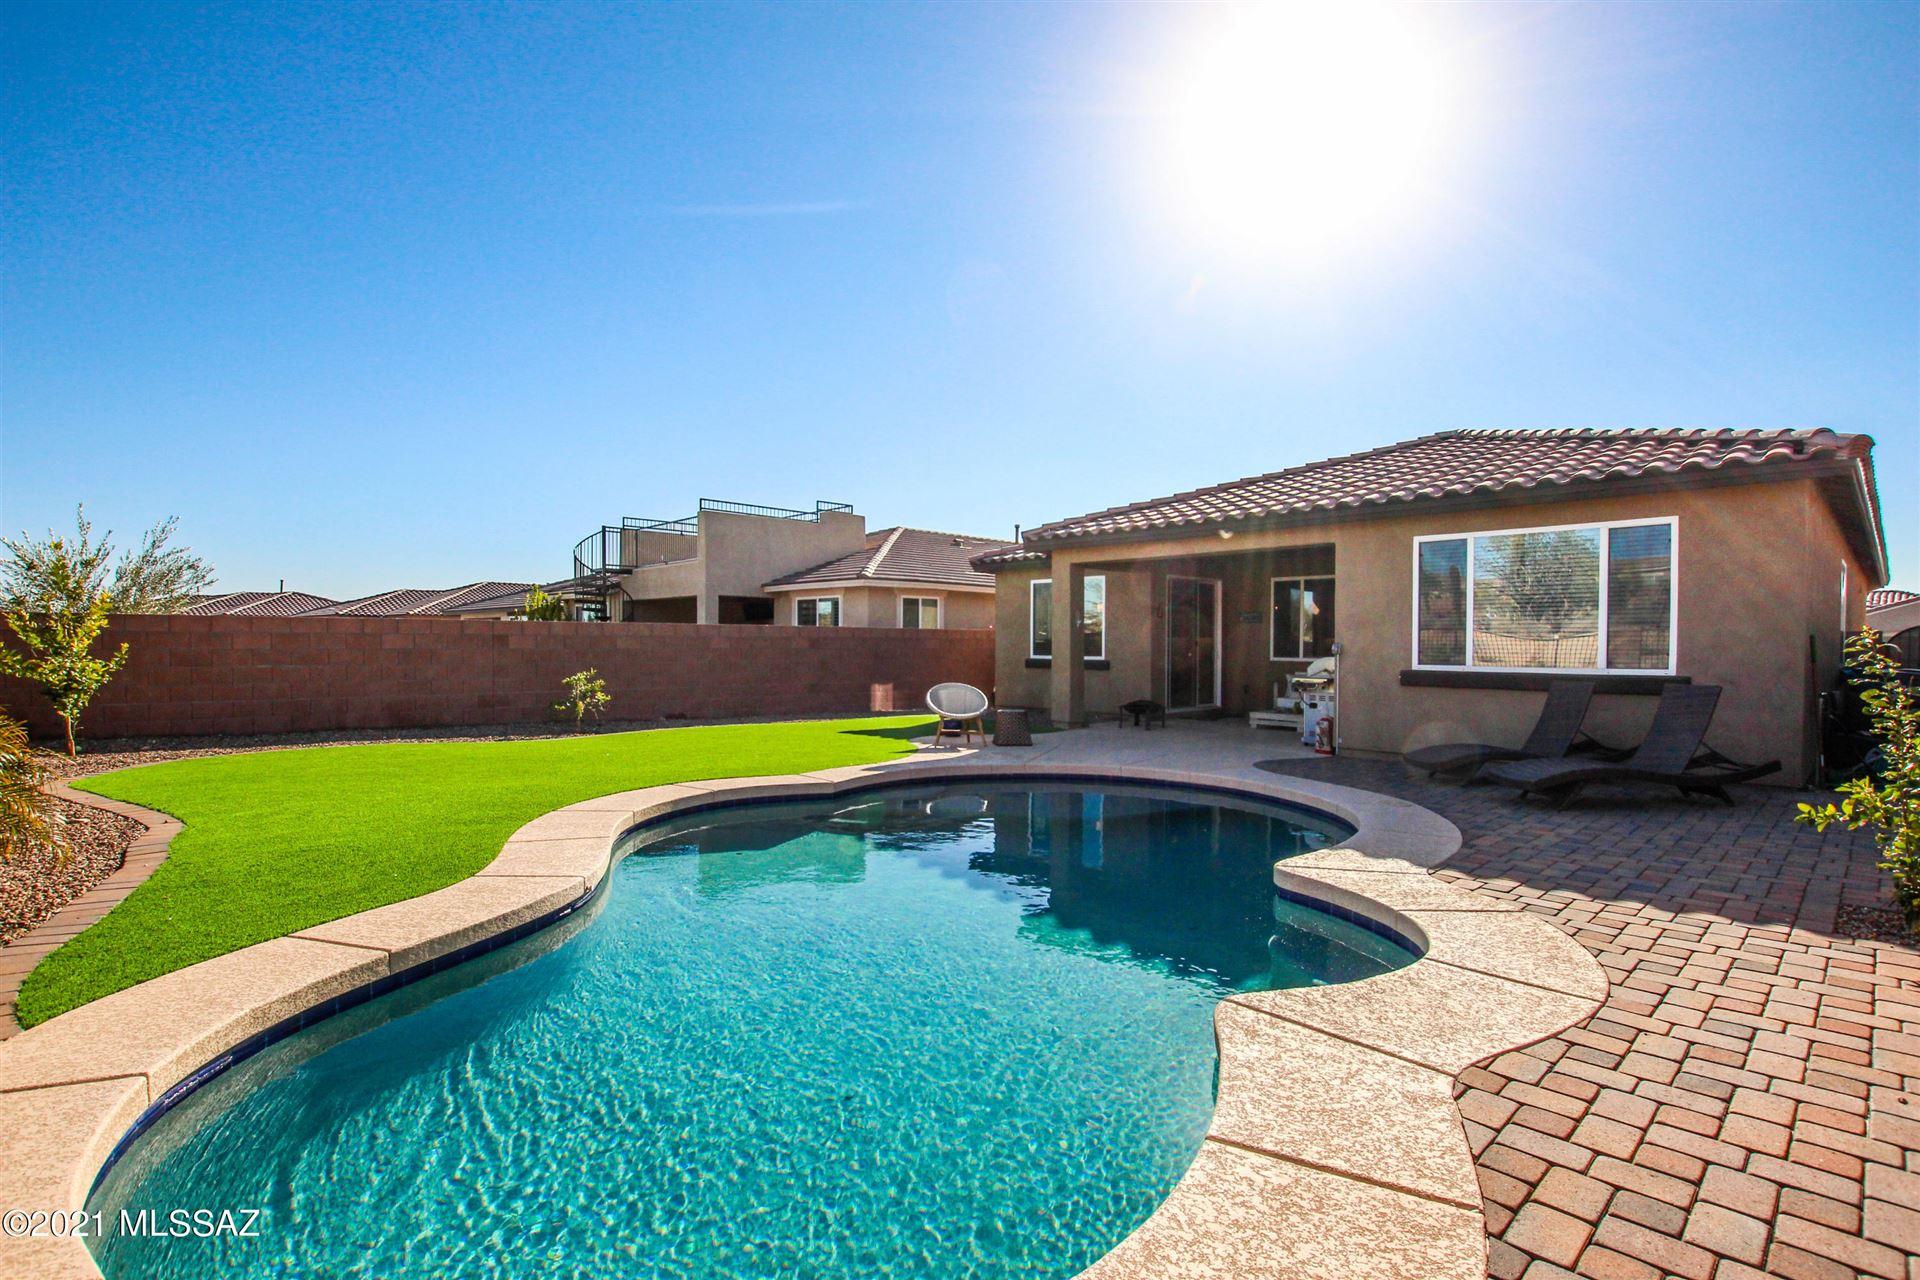 14140 N Silverleaf Lane, Marana, AZ 85658 - MLS#: 22105735